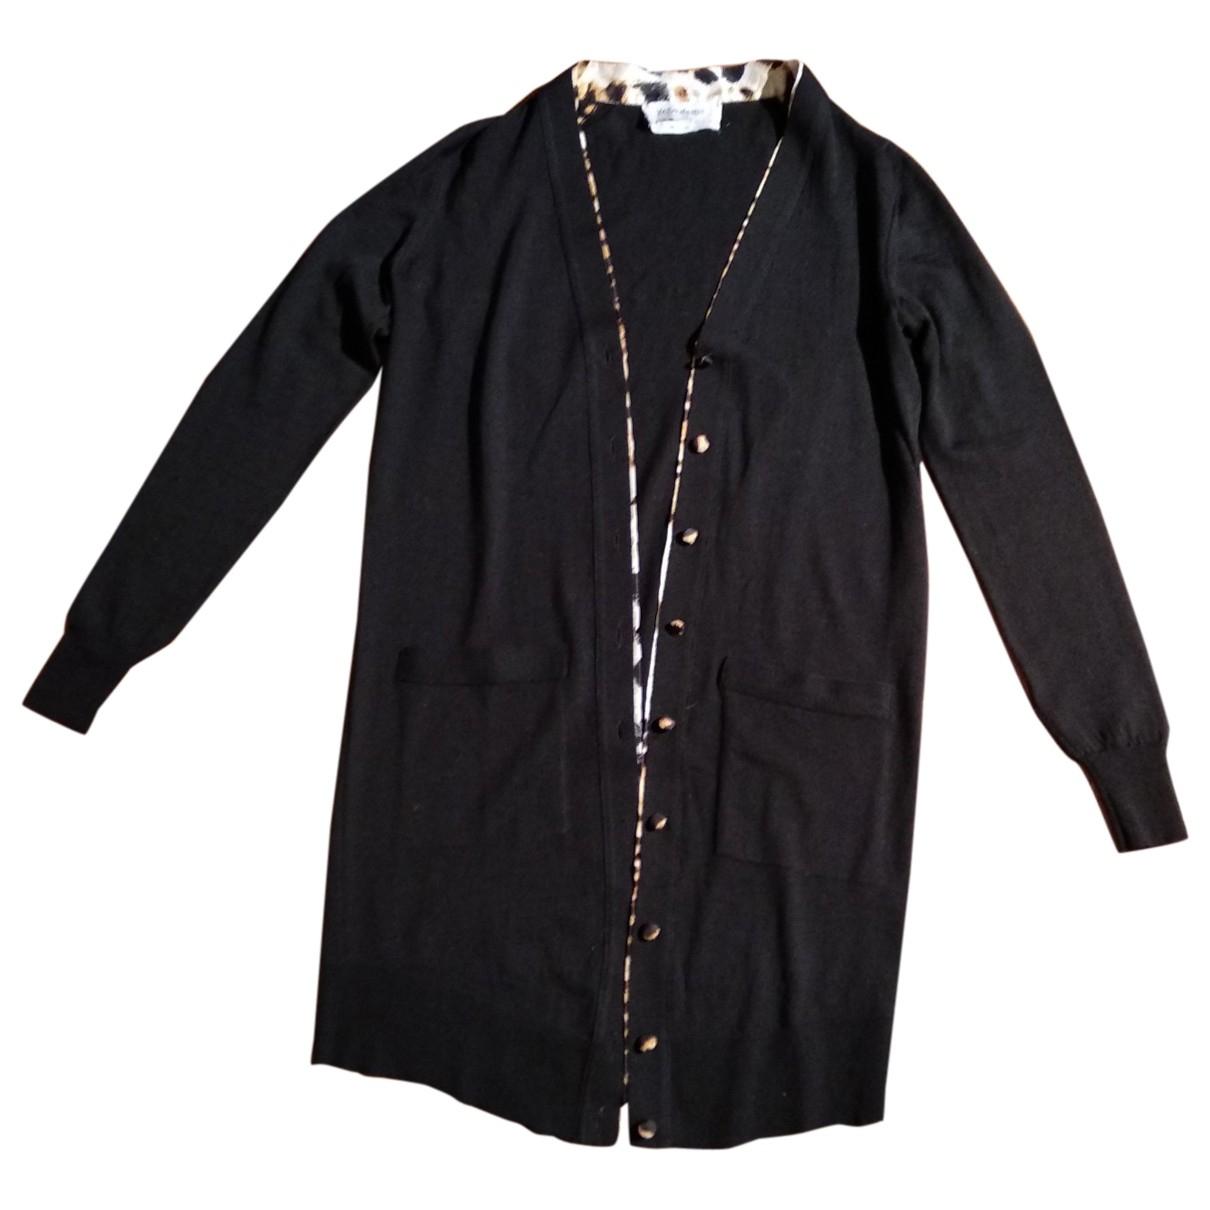 Yves Saint Laurent \N Pullover in  Schwarz Wolle